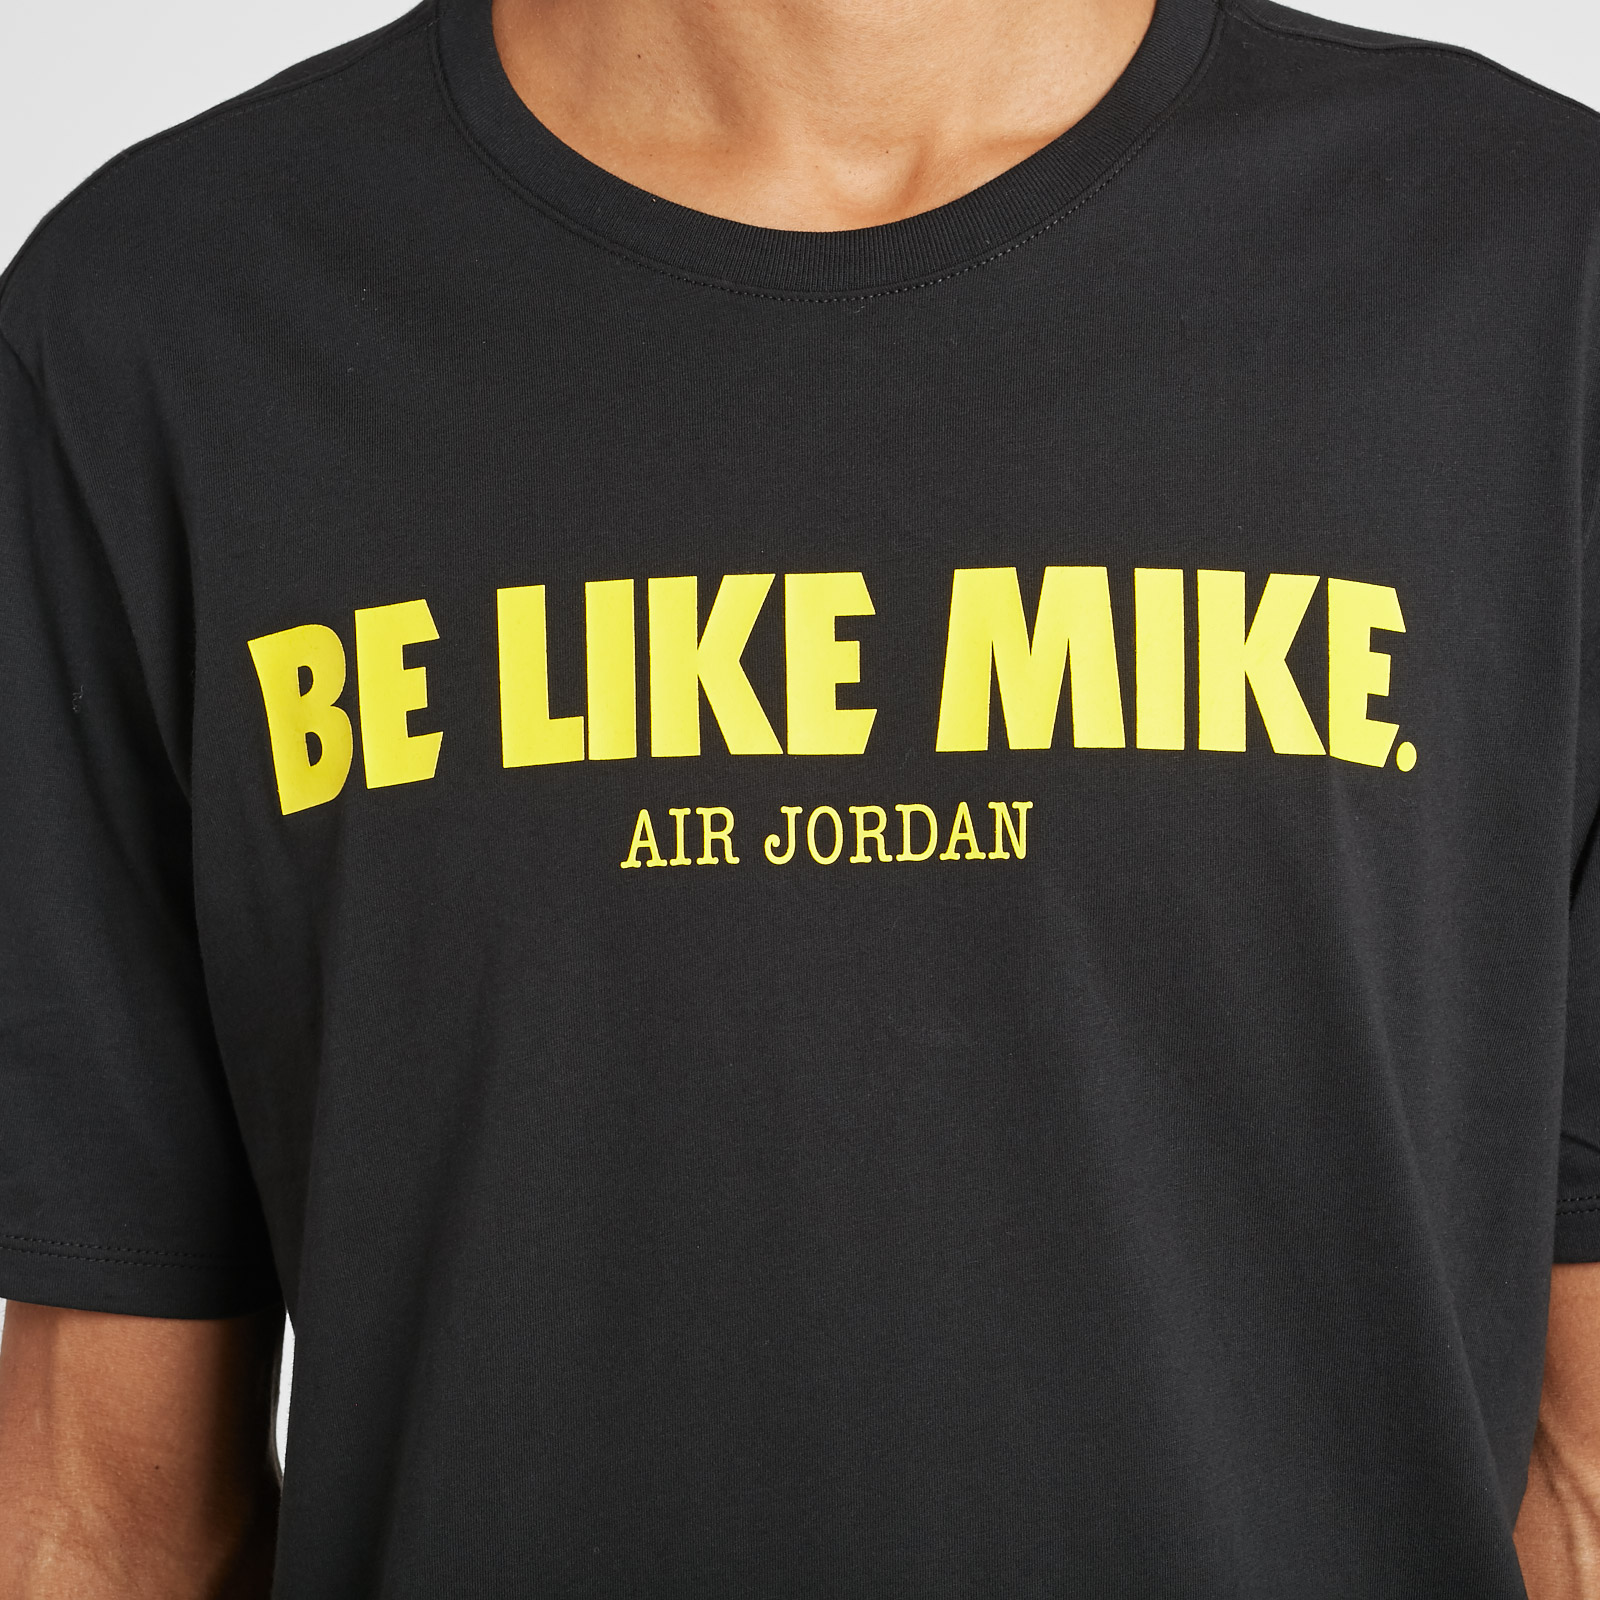 e268ea800263 Jordan Brand M Jsw Tee Be Like Mike Vrbg - Aj1161-010 ...